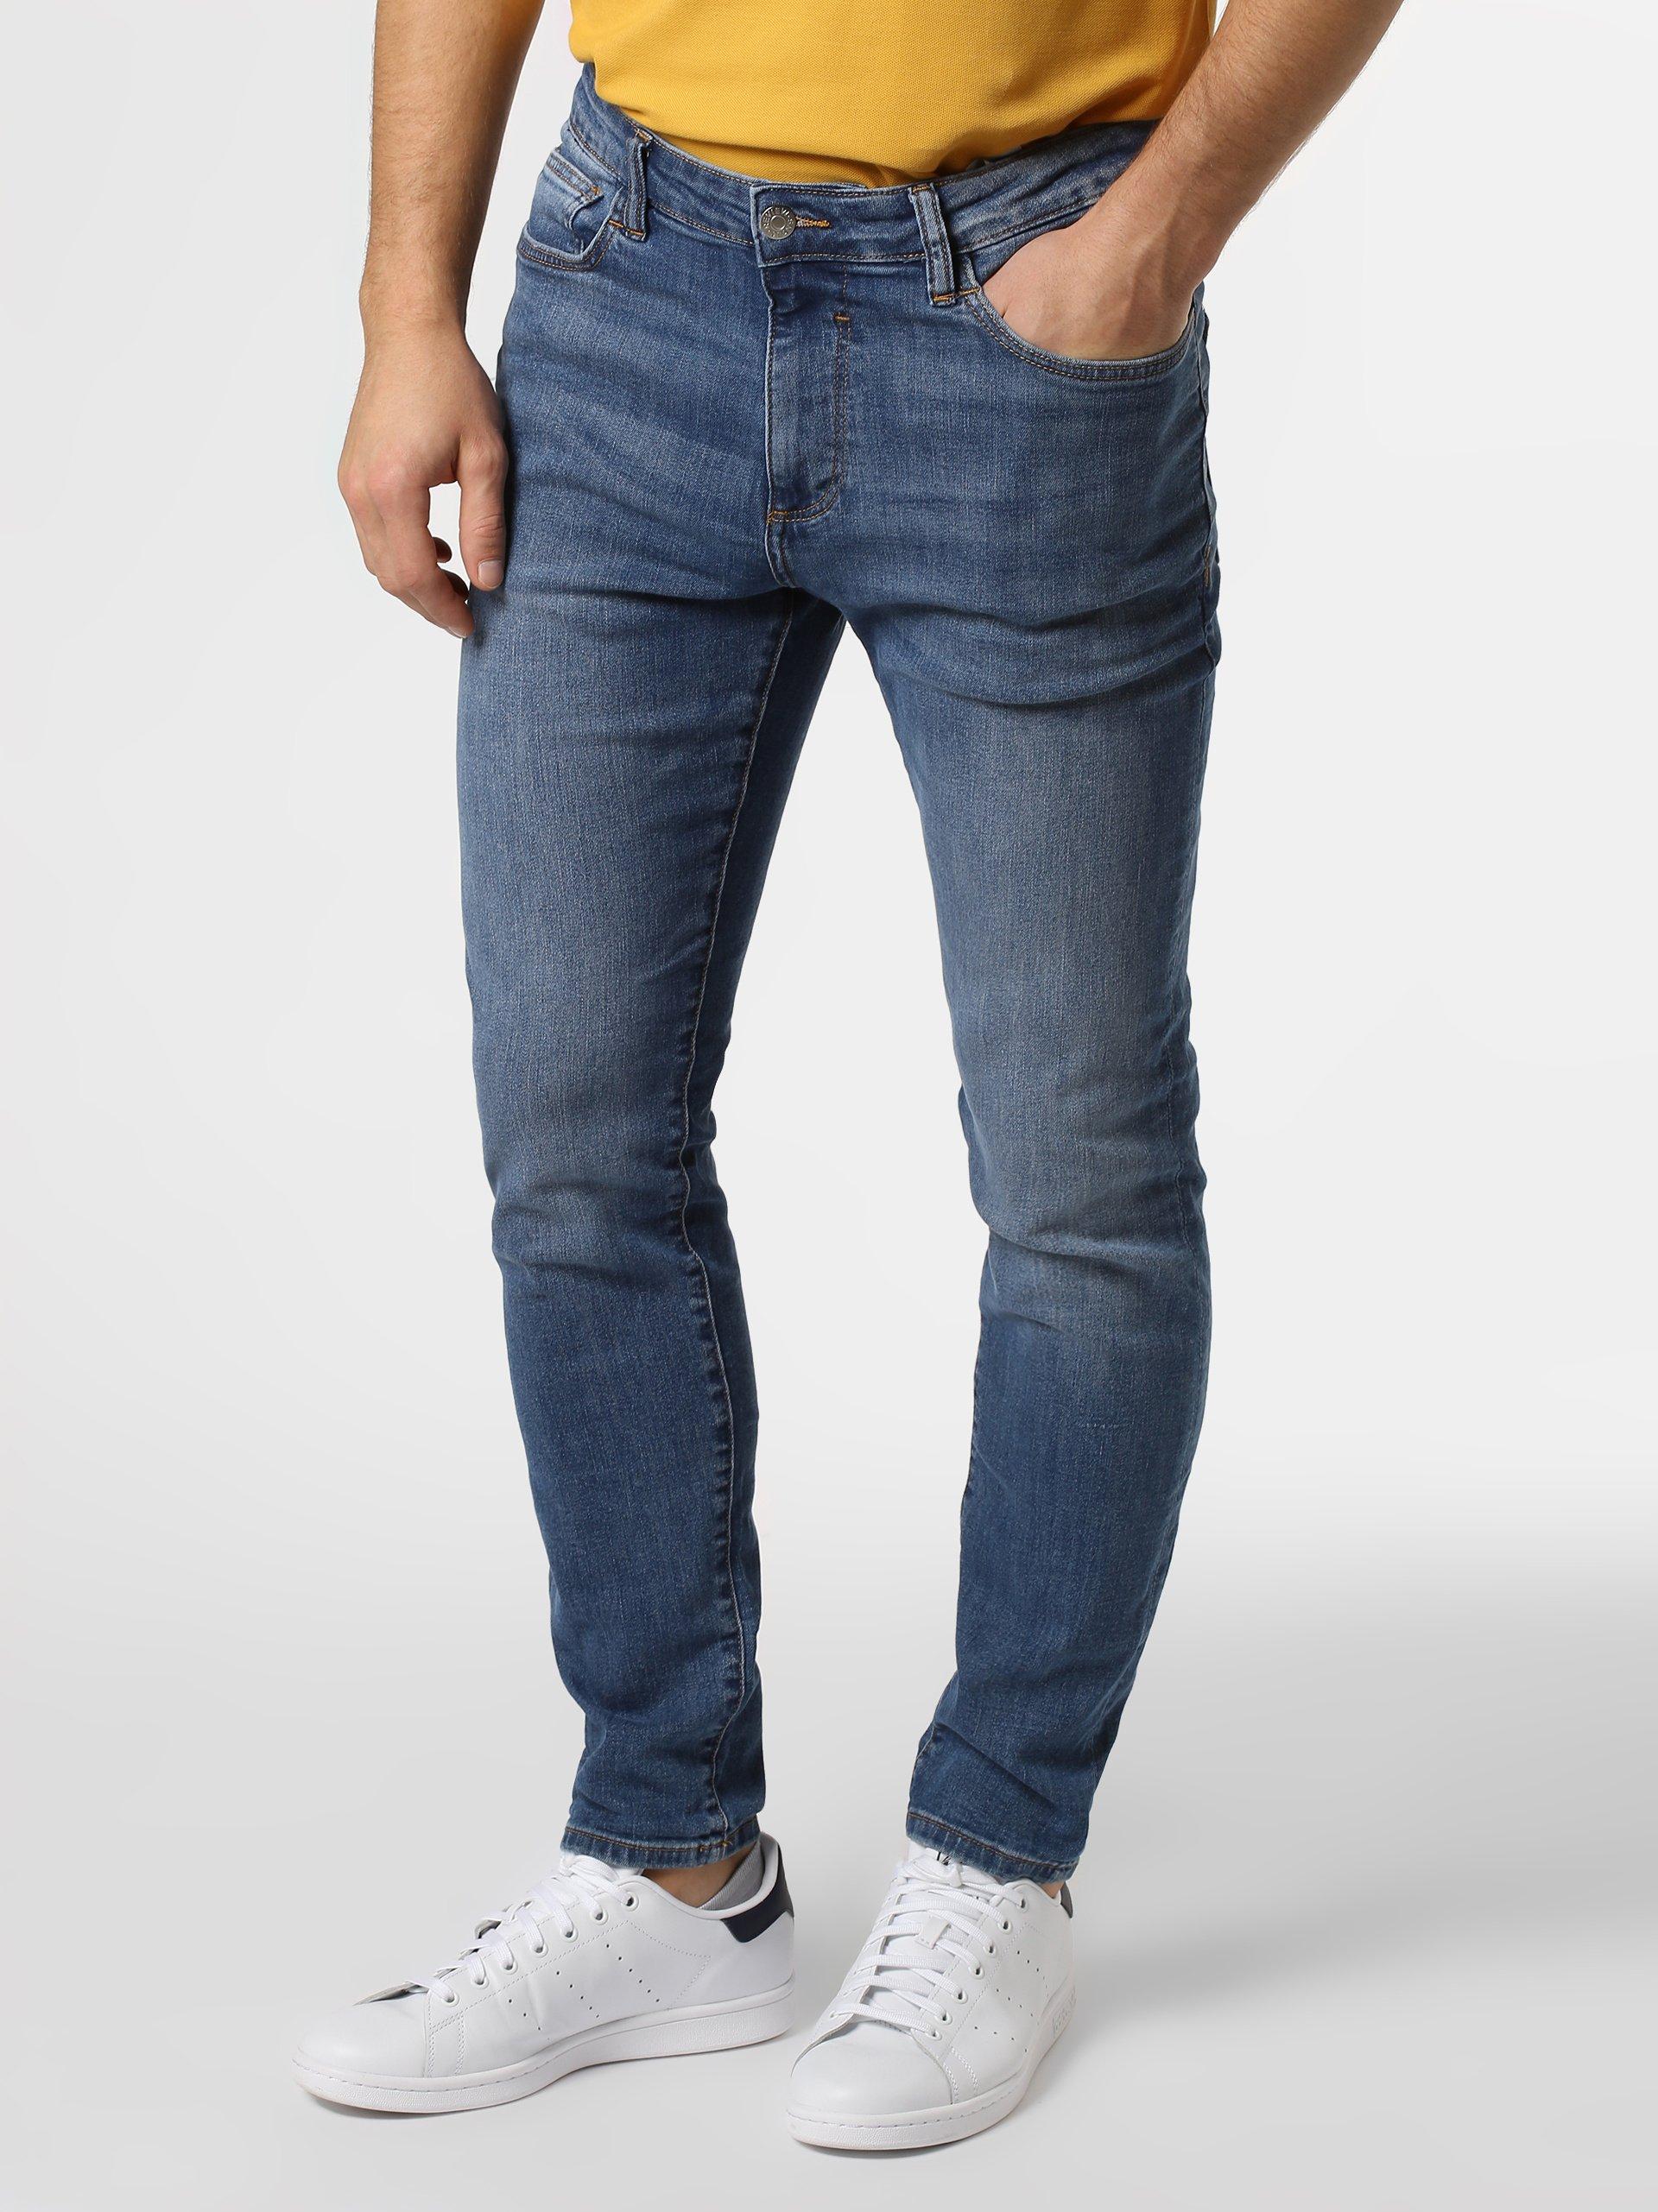 Review Herren Jeans - Jeremy Skinny